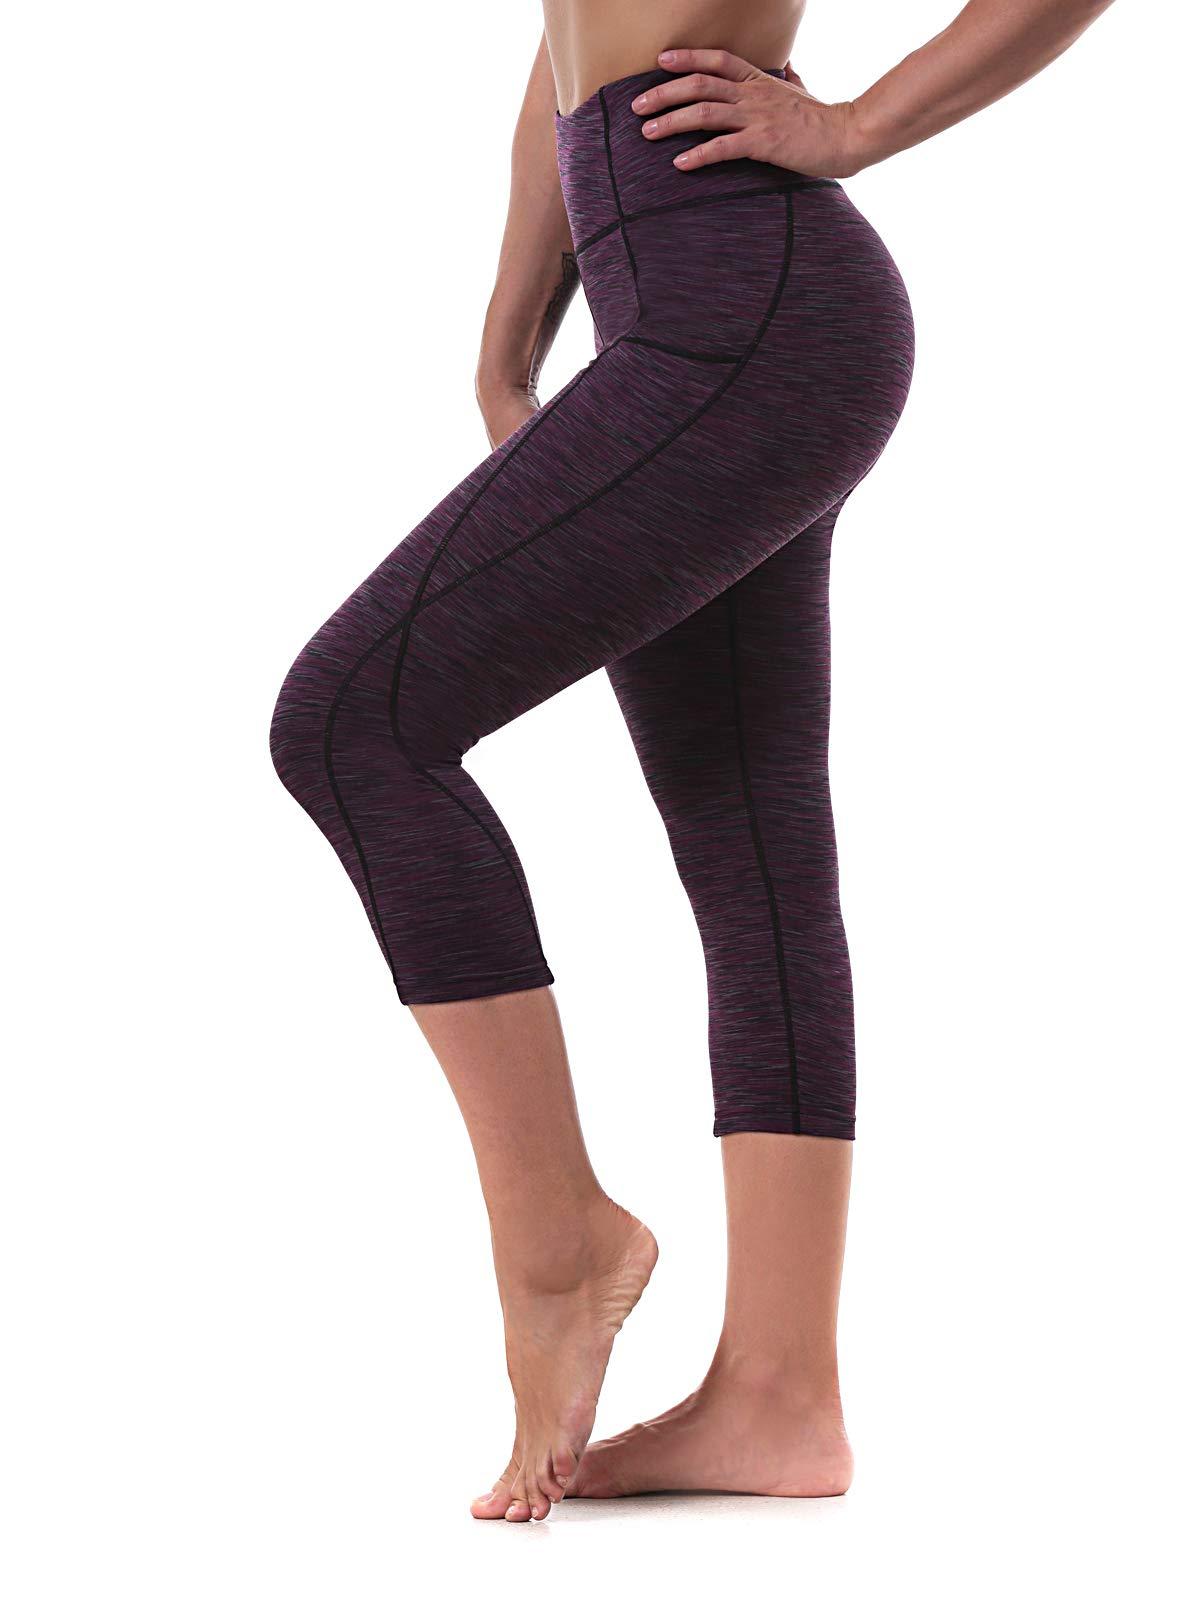 Ritiriko Women's Yoga Pants High Waisted Workout Running Leggings Tummy Control Yoga Capris